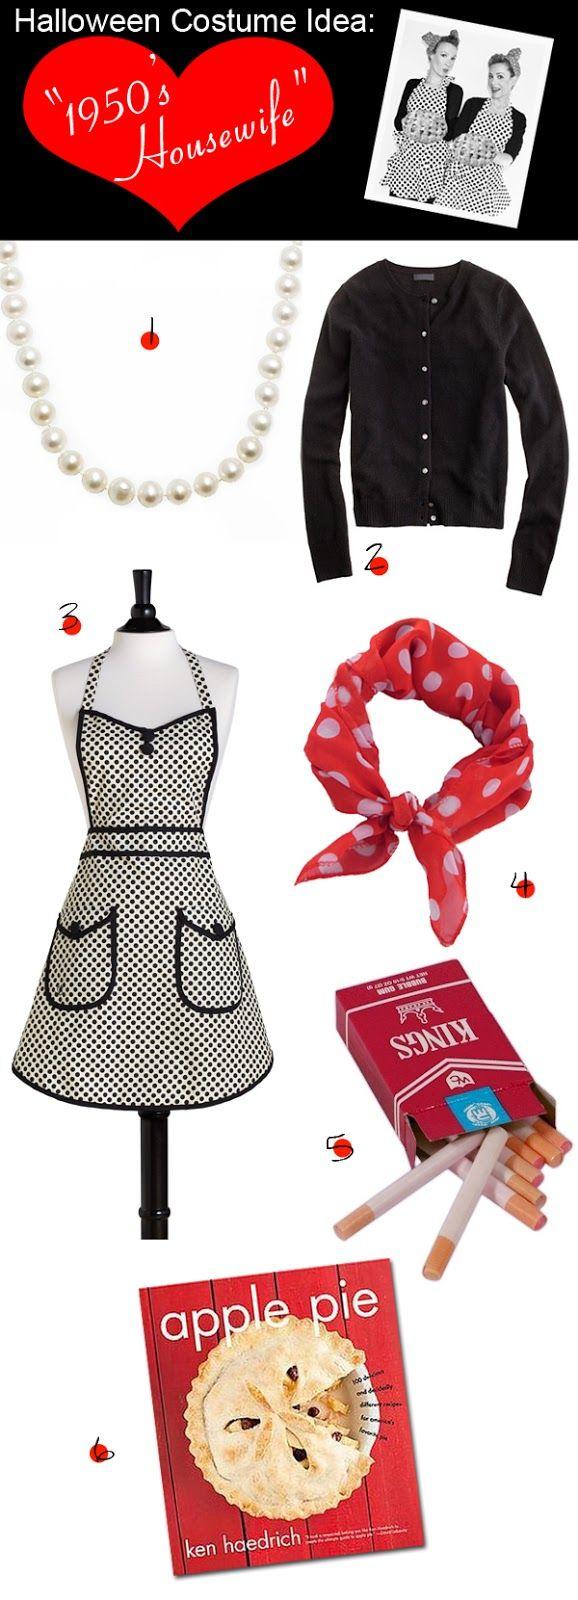 Fashionably Bombed: DIY Halloween Costume: 1950's Housewife Minus the cigs, I like this idea!